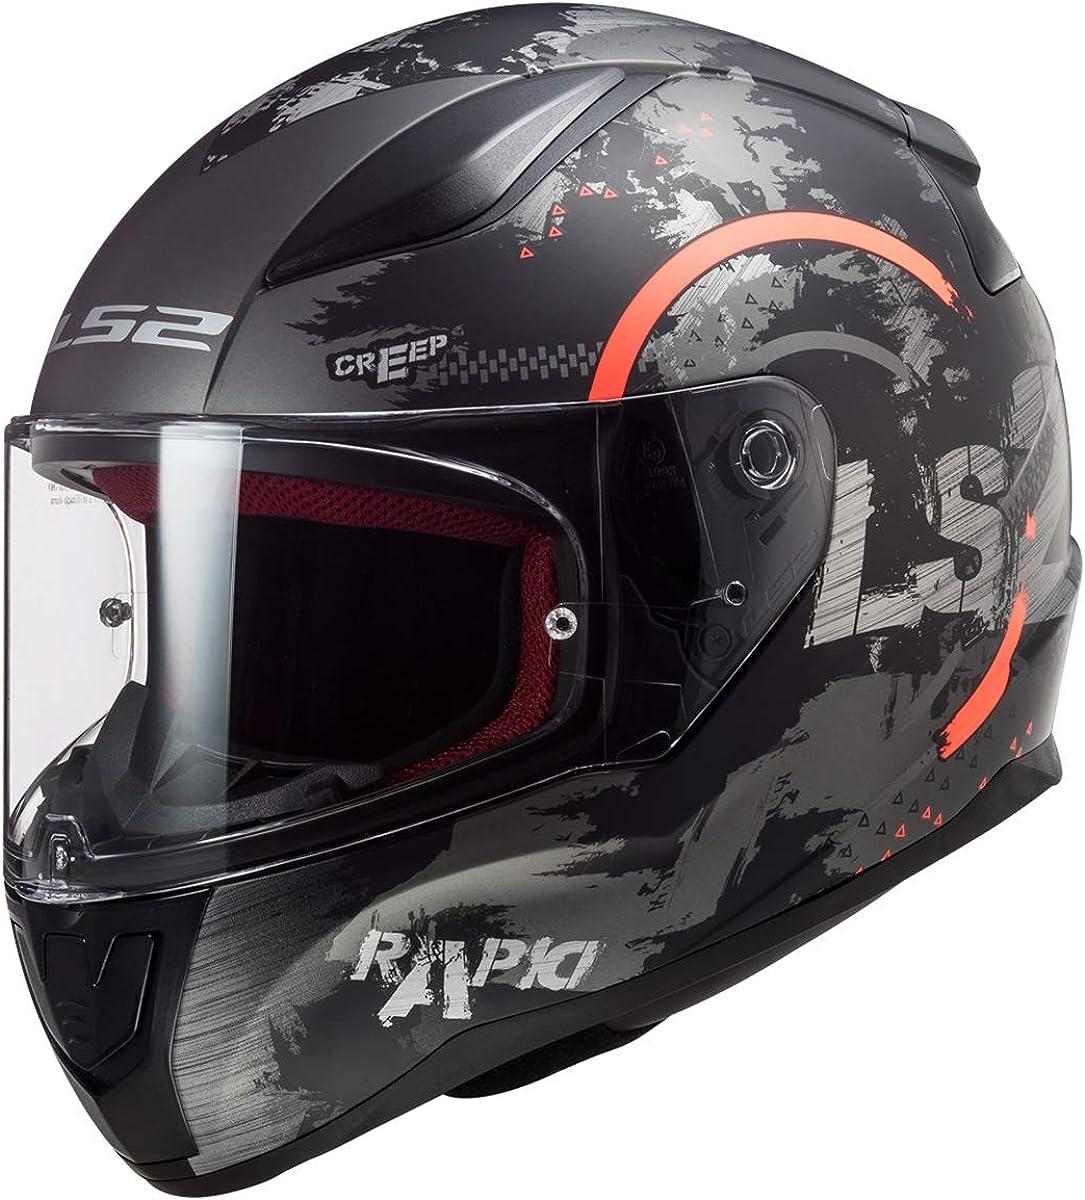 LS2 Helmets Full Face Street Rapid Max 45% OFF Cheap SALE Start Helmet